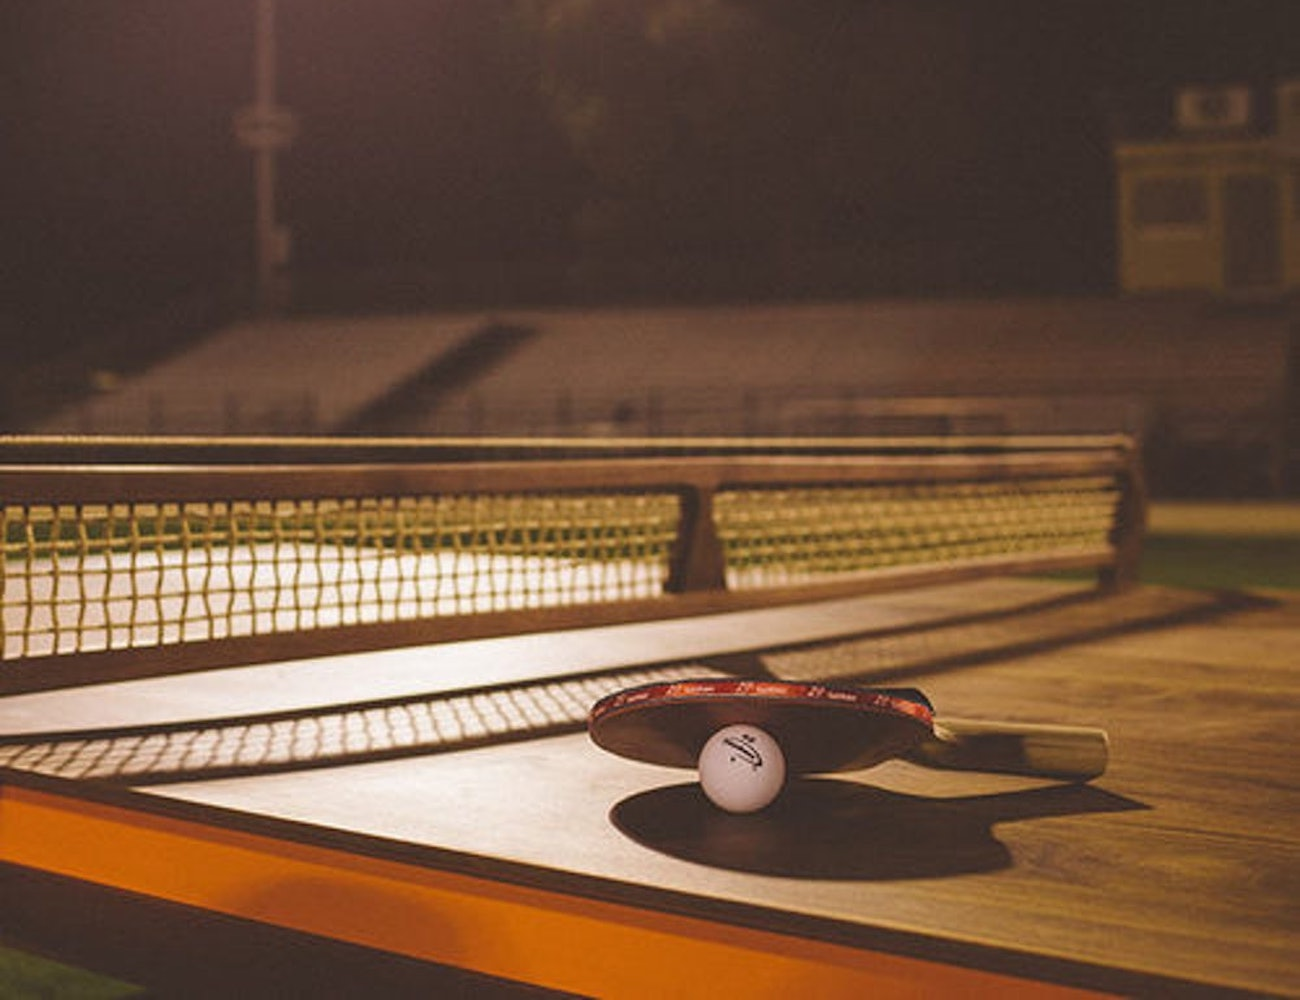 Jory Brigham Mackenrow Wooden Table Tennis